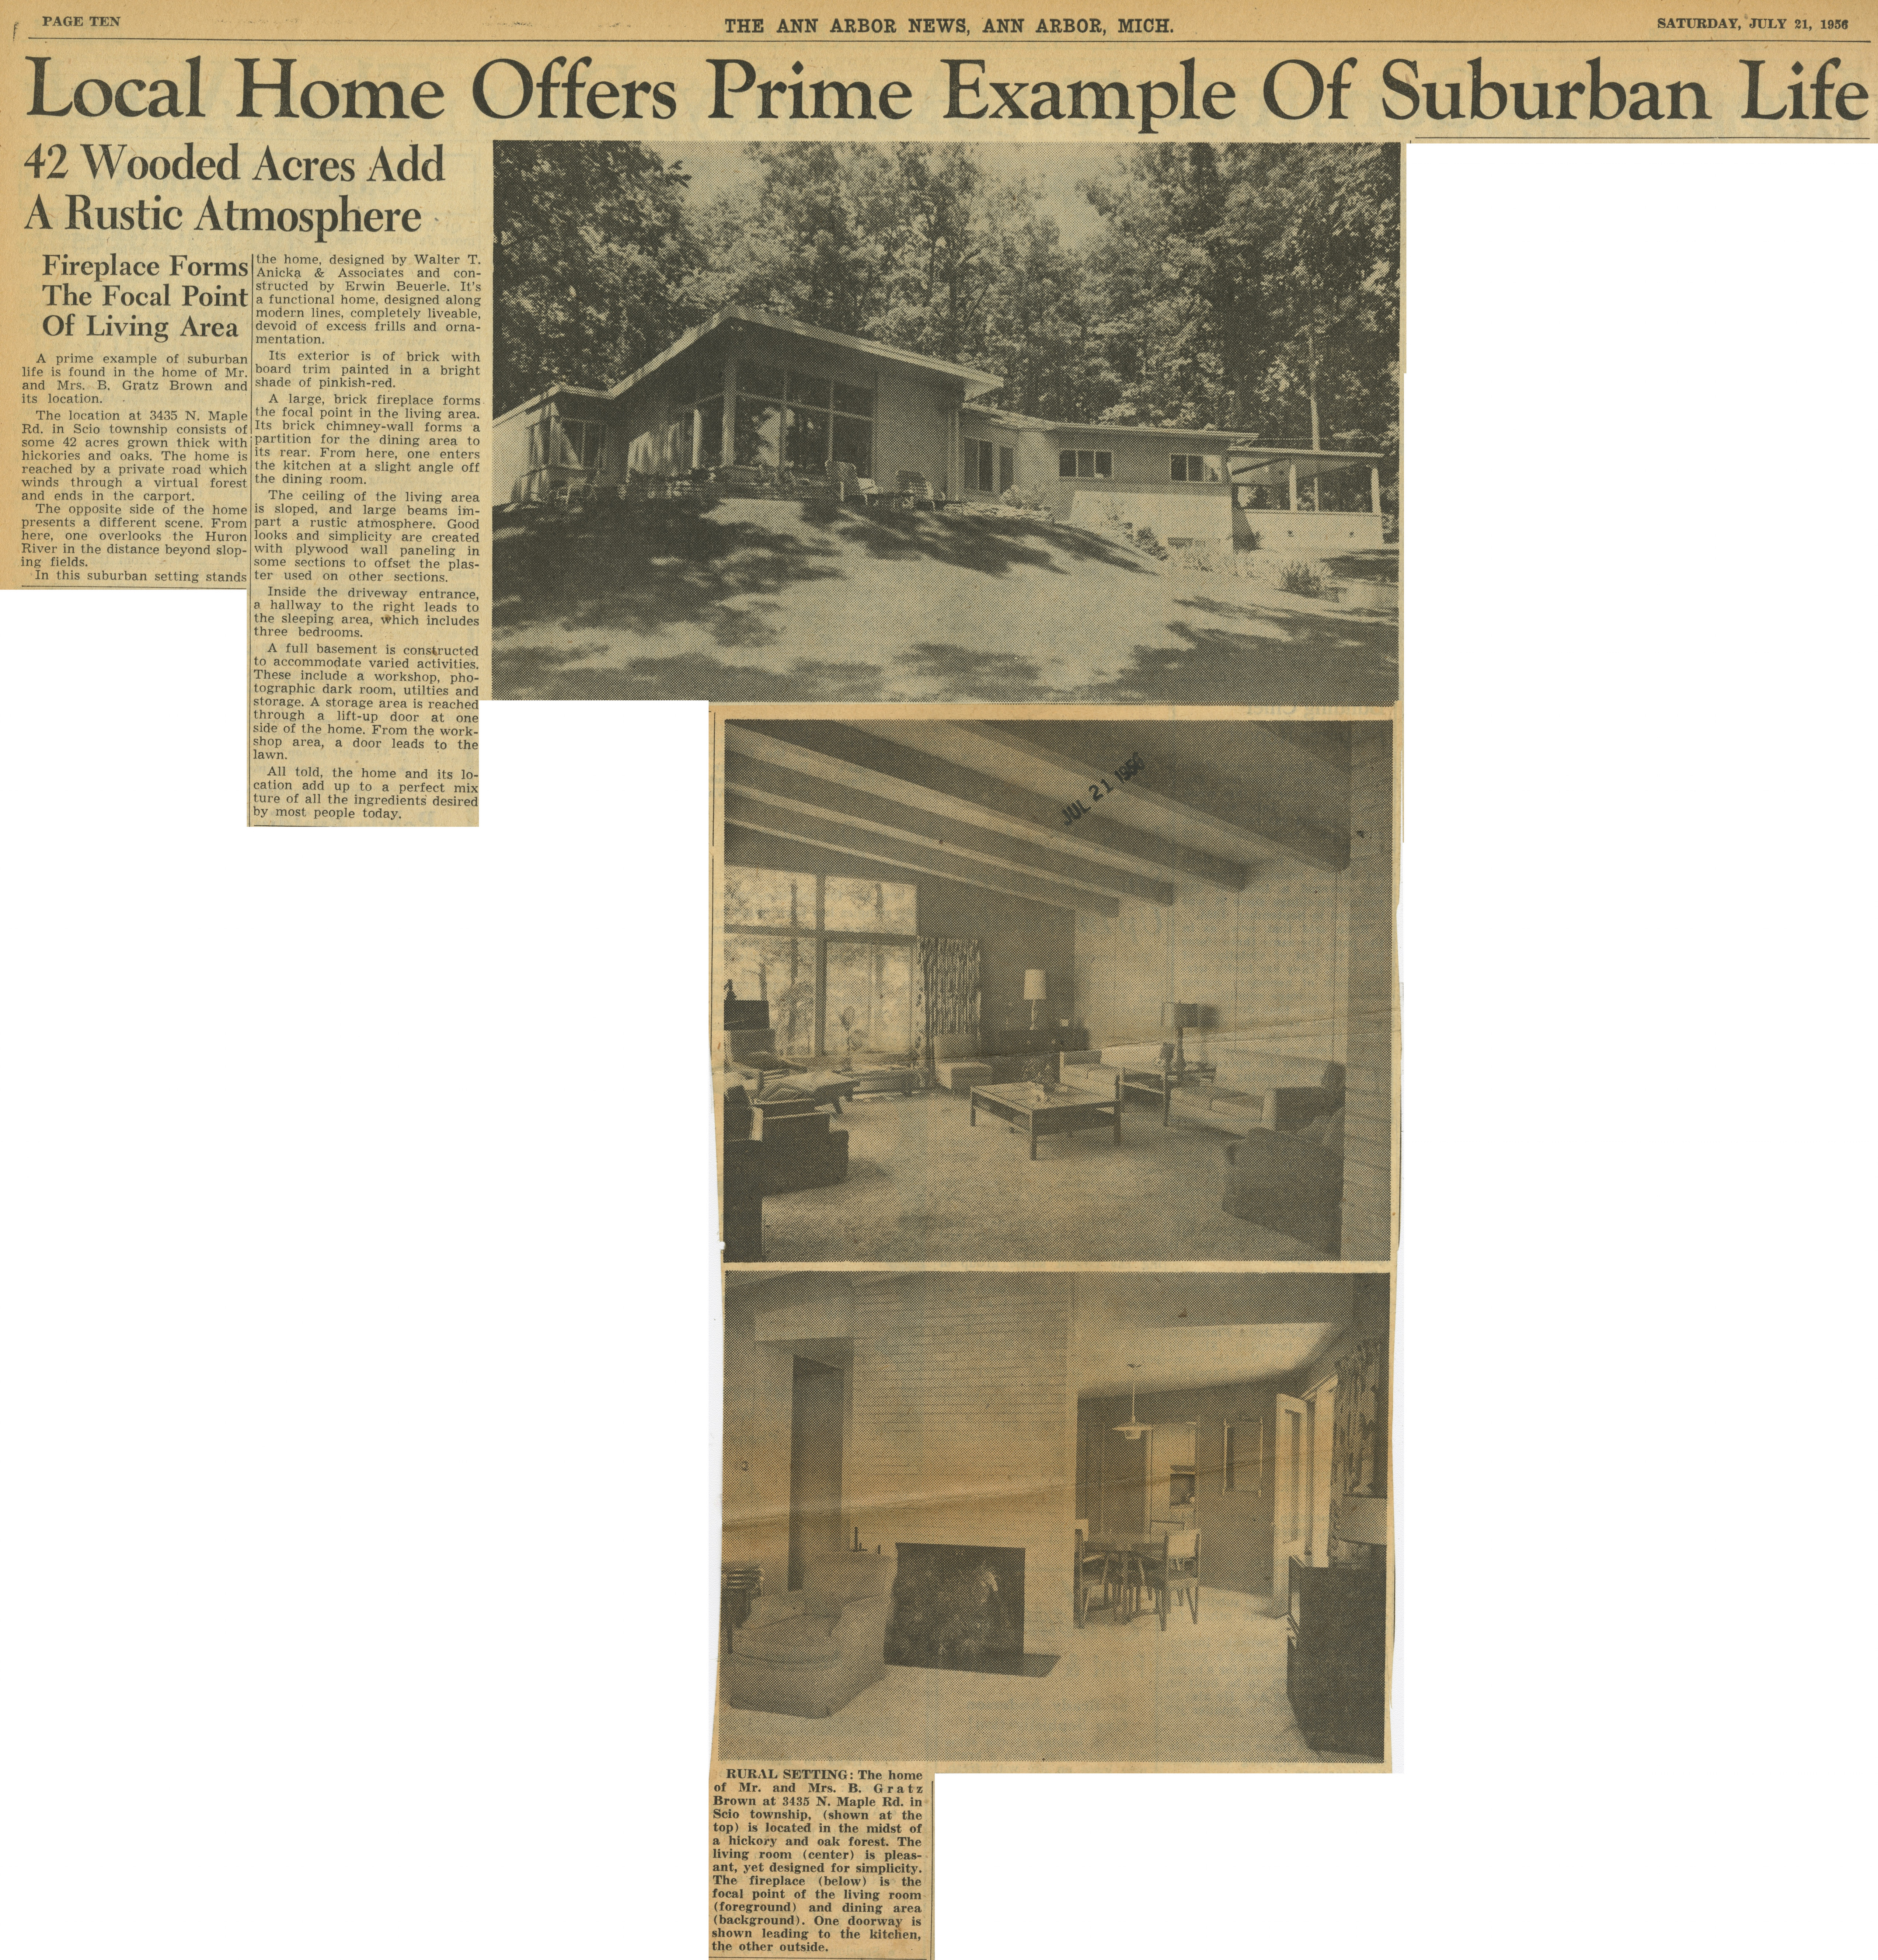 Suburban Ann Arbor >> Local Home Offers Prime Example Of Suburban Life Ann Arbor